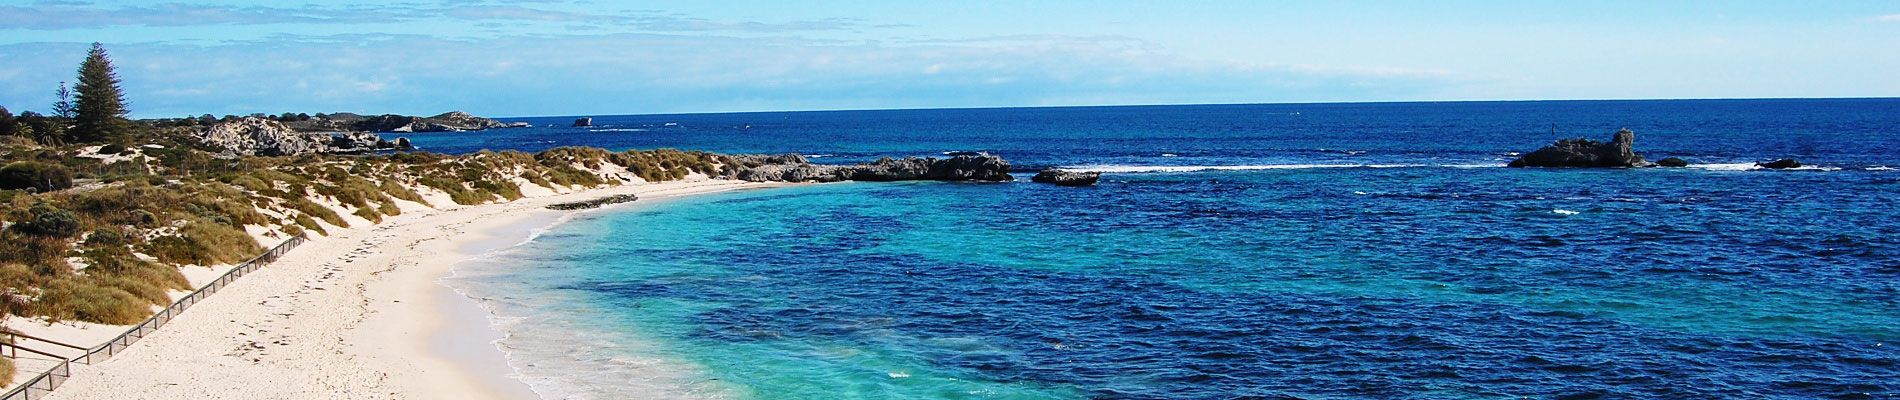 australie-rottnest-island-st